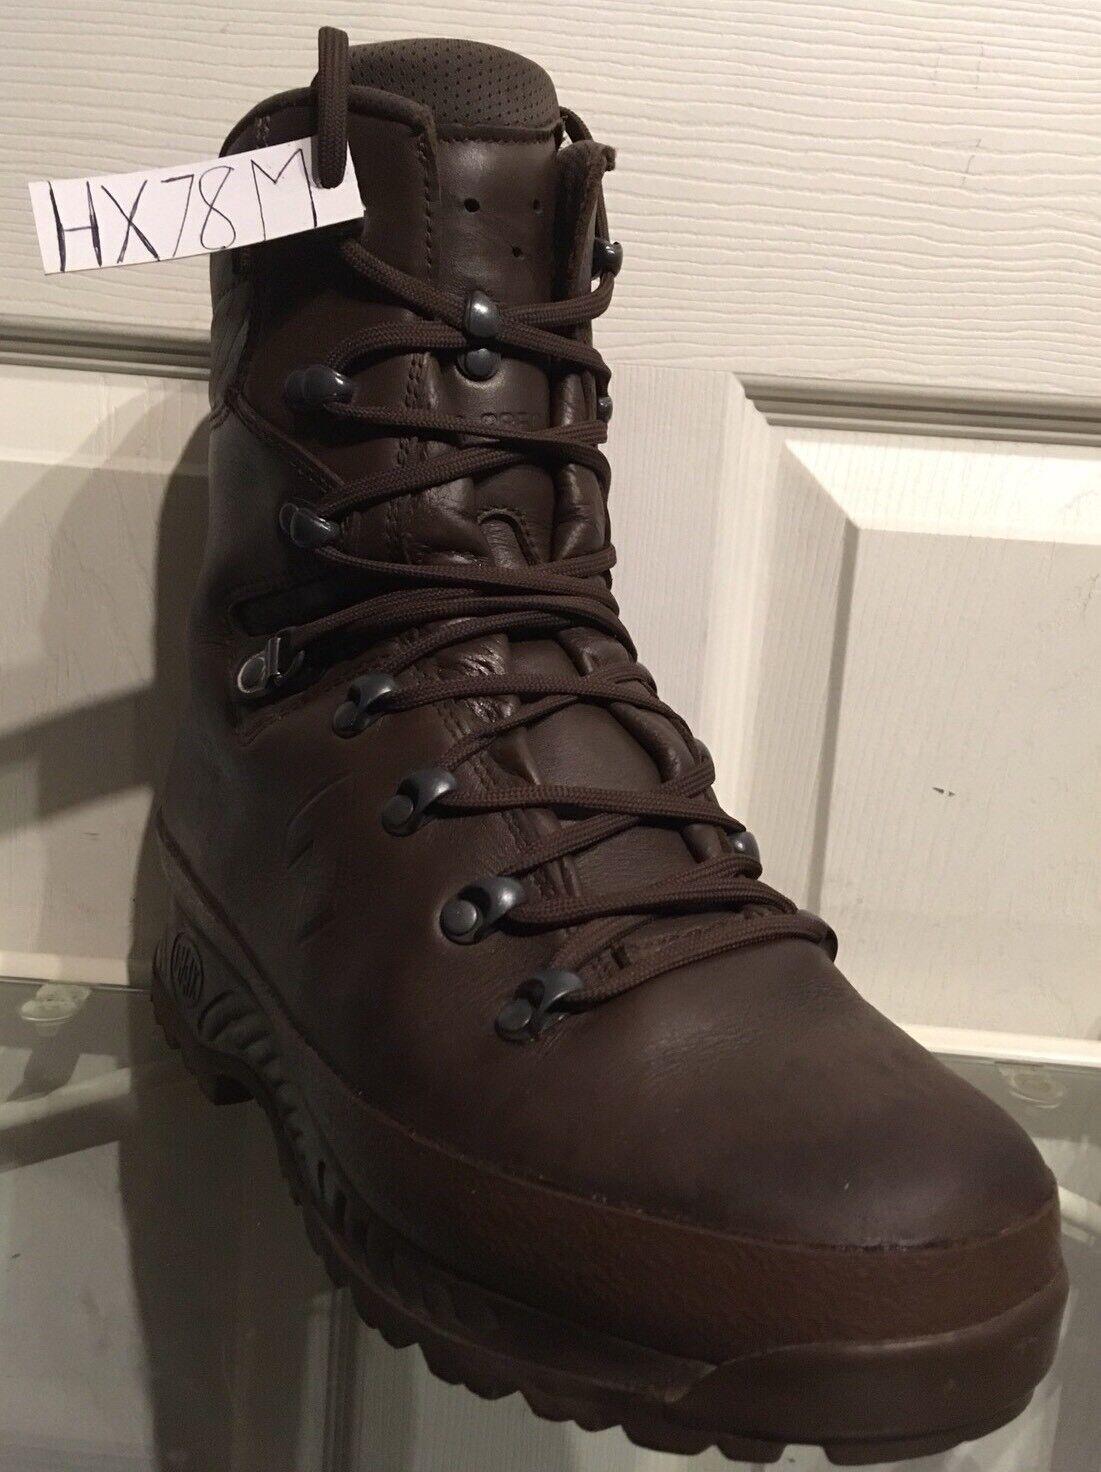 Laredo Men's Atlanta Boot, Western Boot, Atlanta Black, Size 9.5 CFUy US / 9 UK a0c755